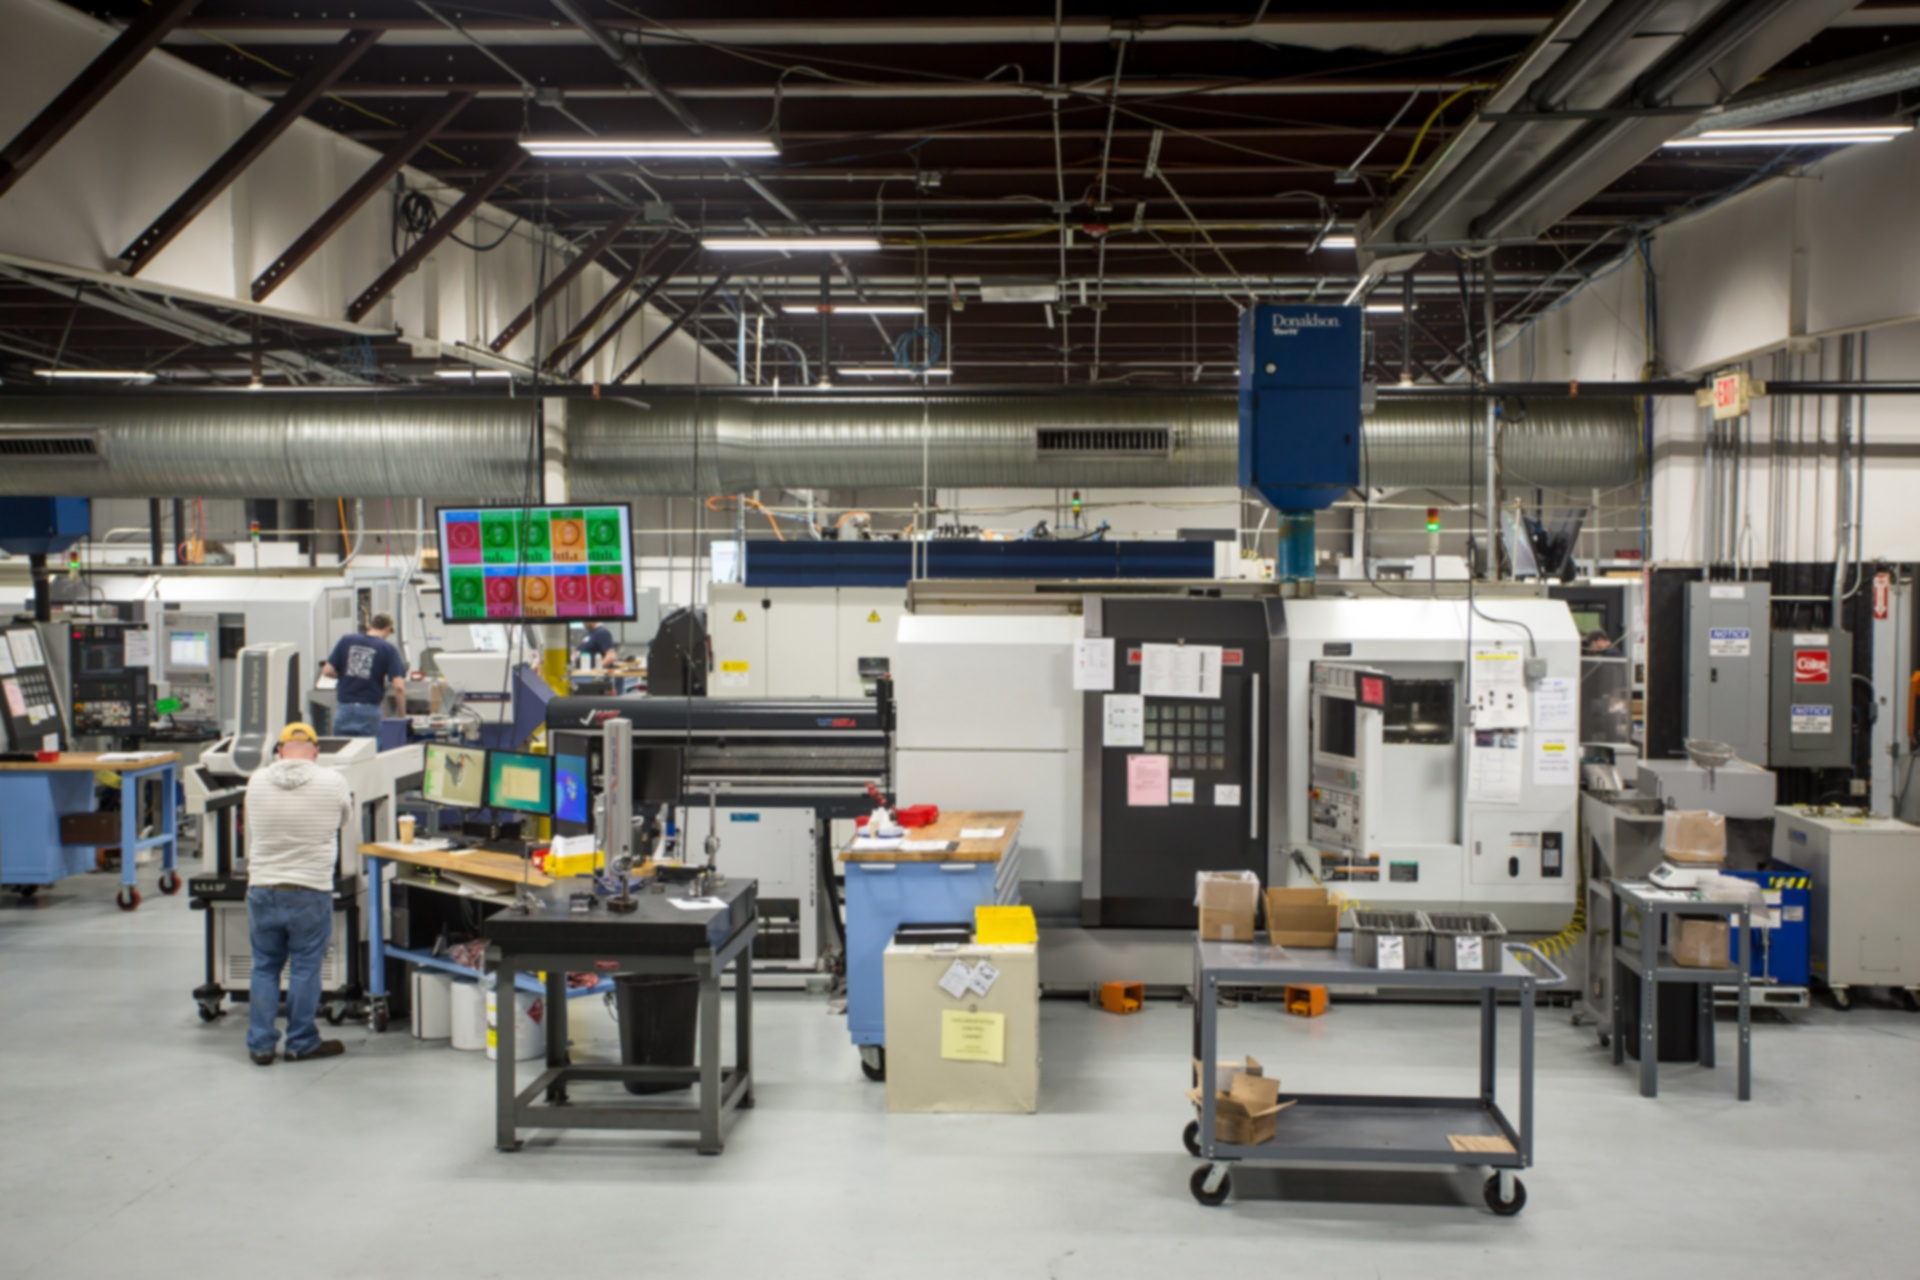 CNC Machine Monitoring Software for OEE & Lean Manufacturing | MachineMetrics